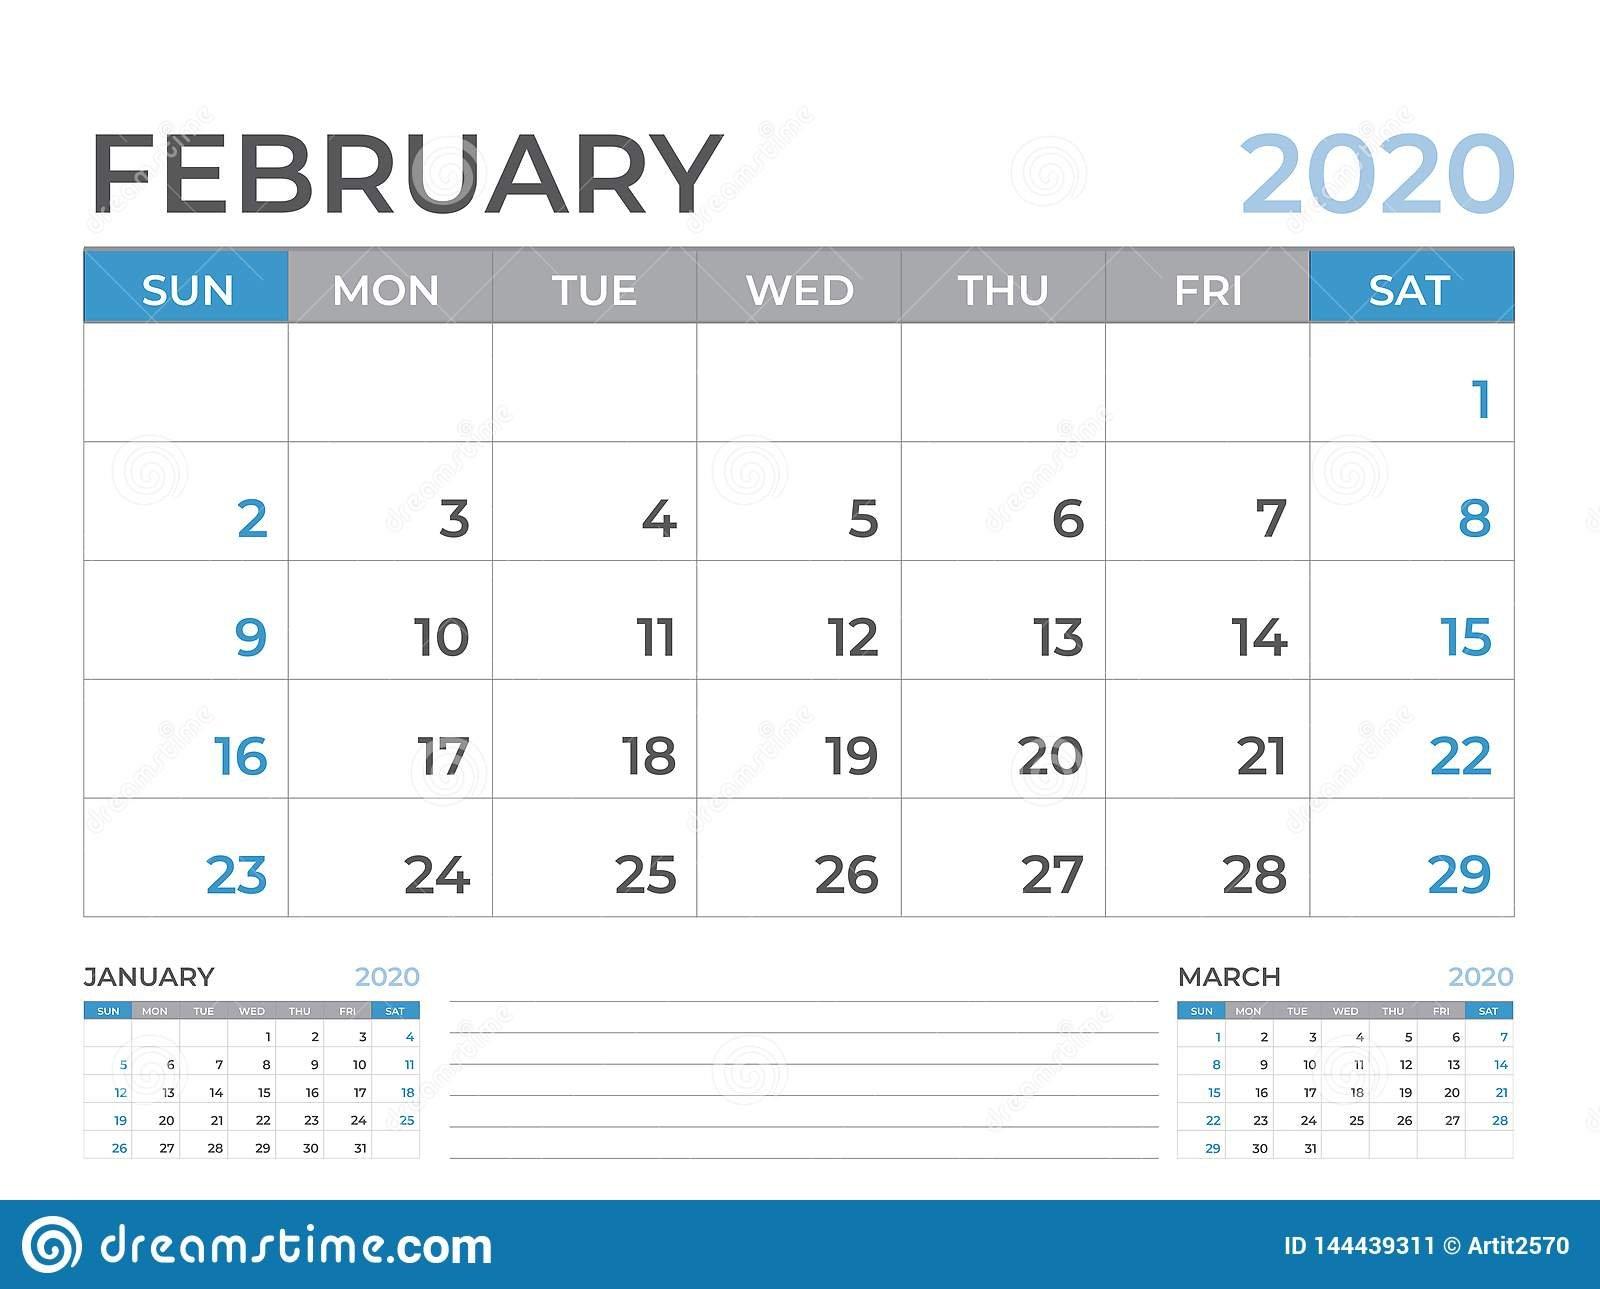 February 2020 Calendar Template, Desk Calendar Layout Size 8 8 By 11 Size Calendar Template